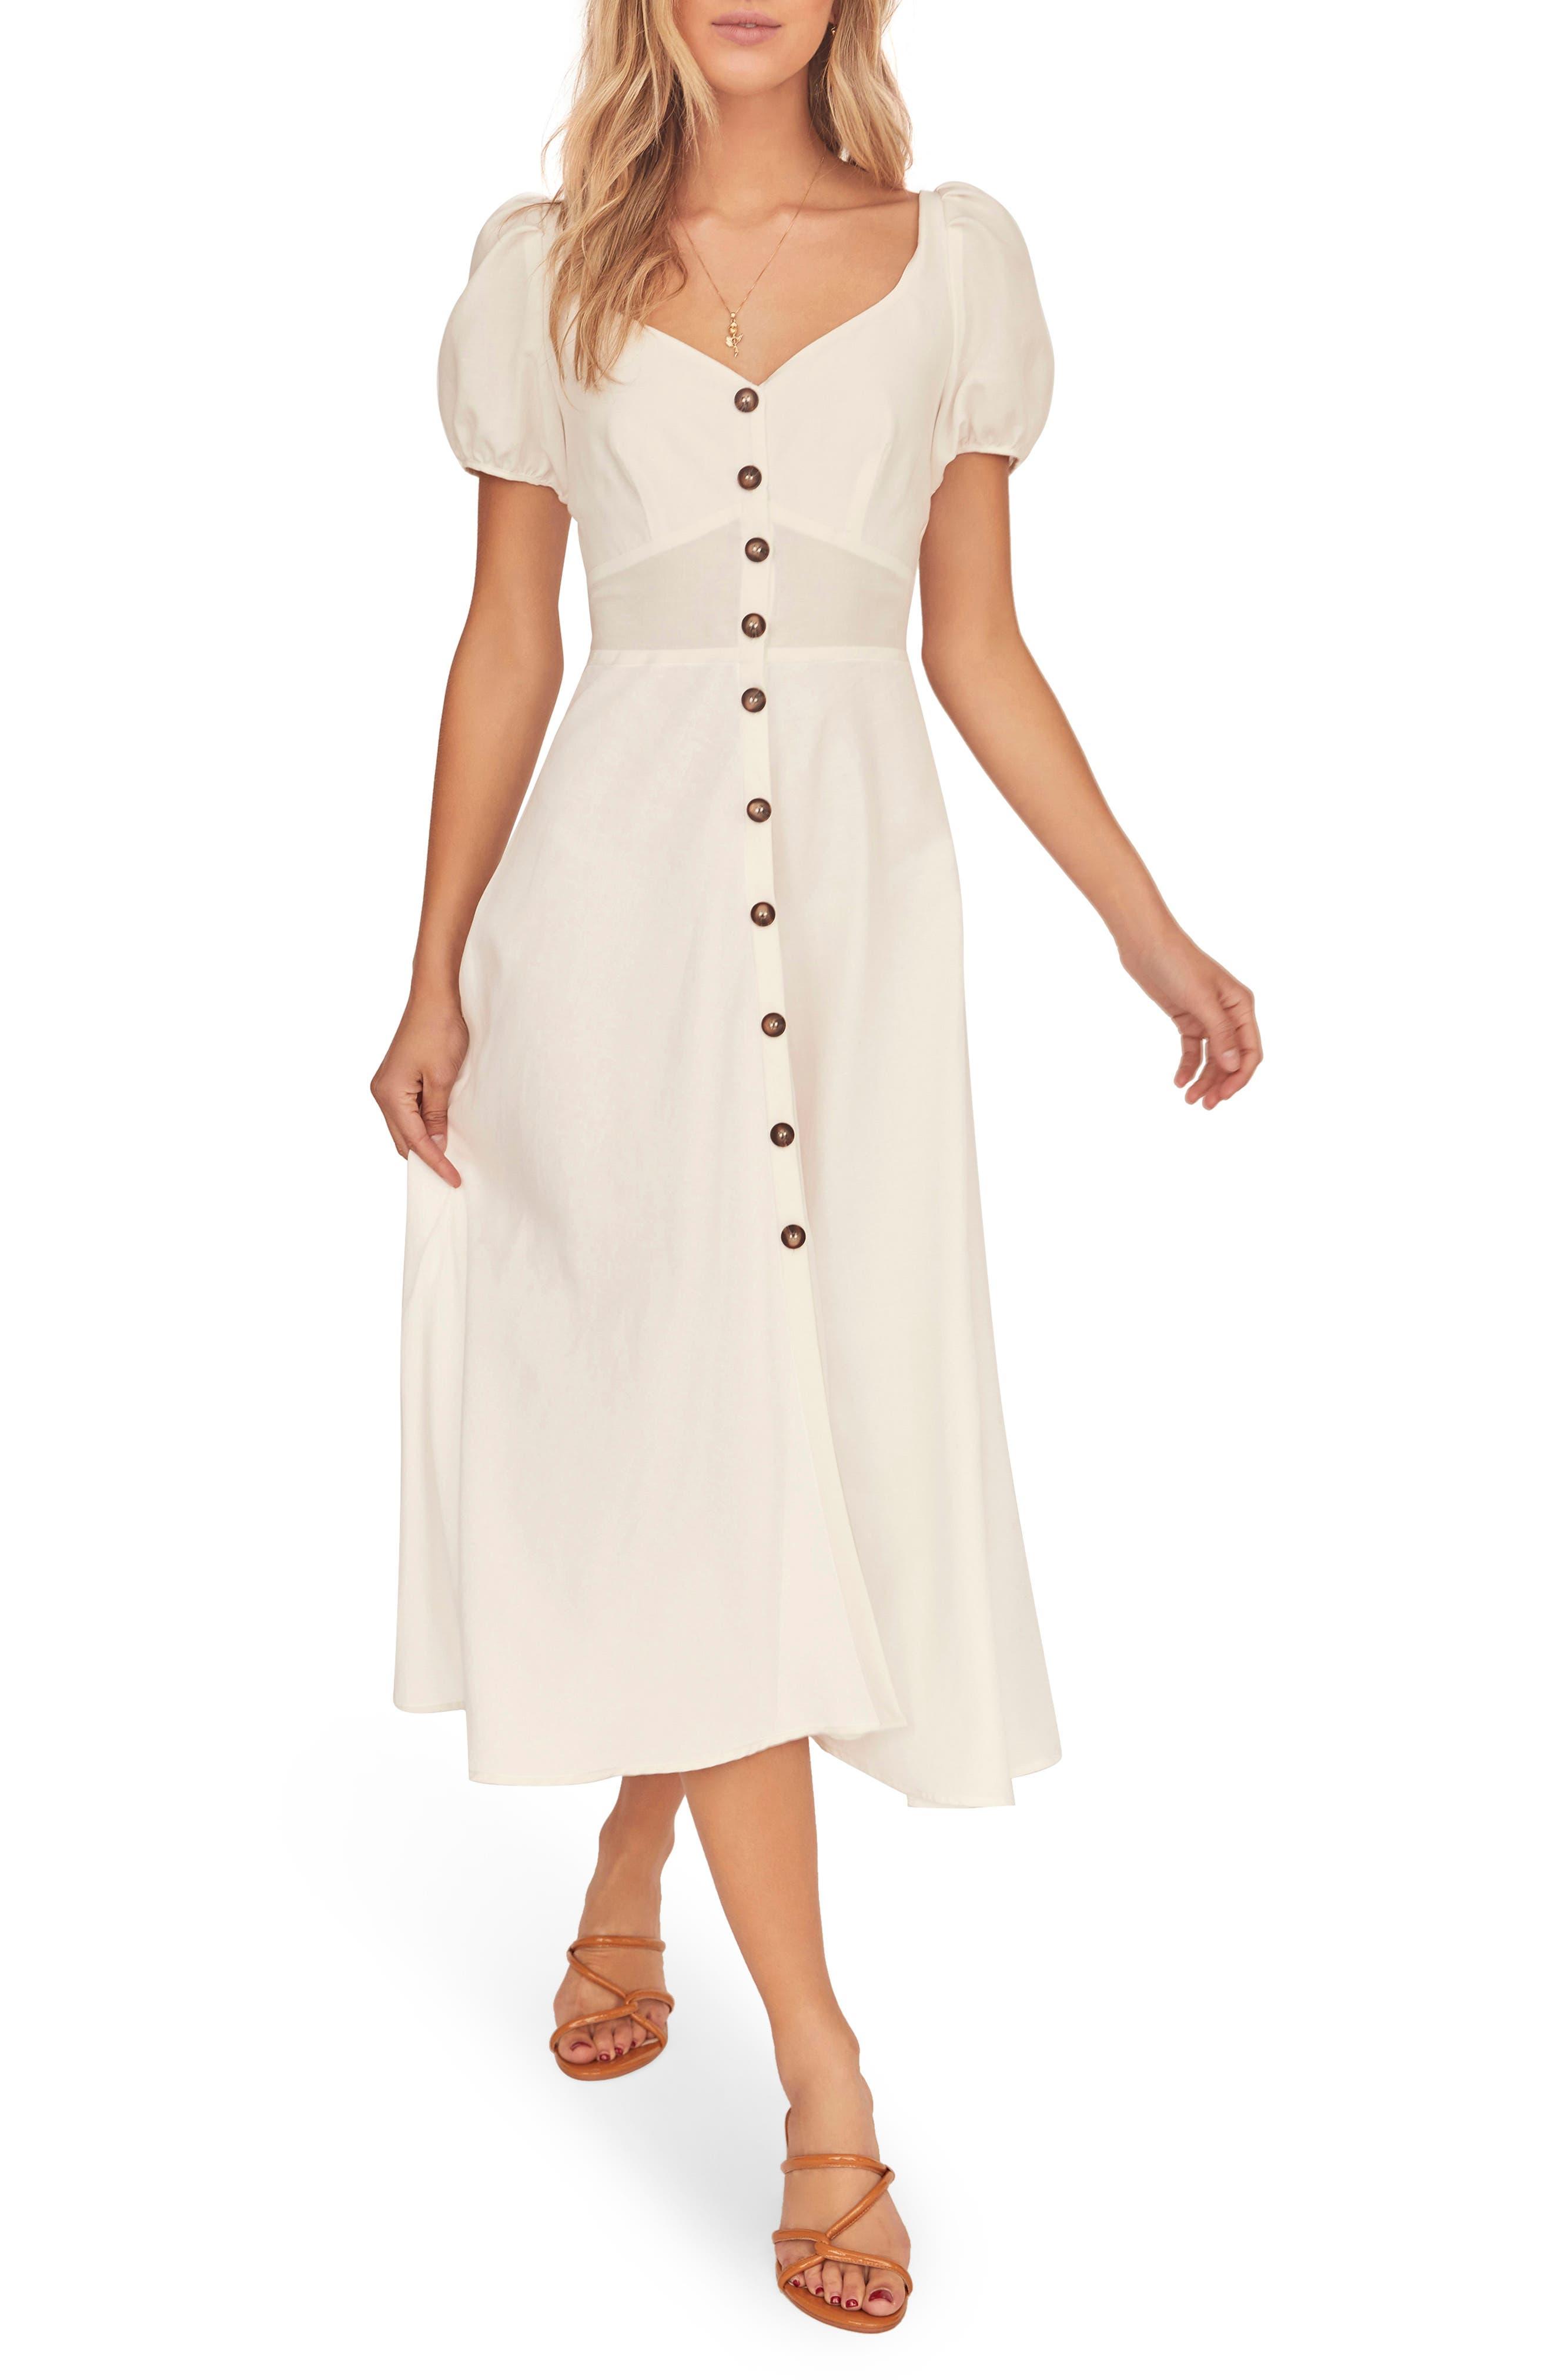 70s Dresses – Disco Dress, Hippie Dress, Wrap Dress Womens Astr The Label Pippa Midi Dress Size Small - White $138.00 AT vintagedancer.com